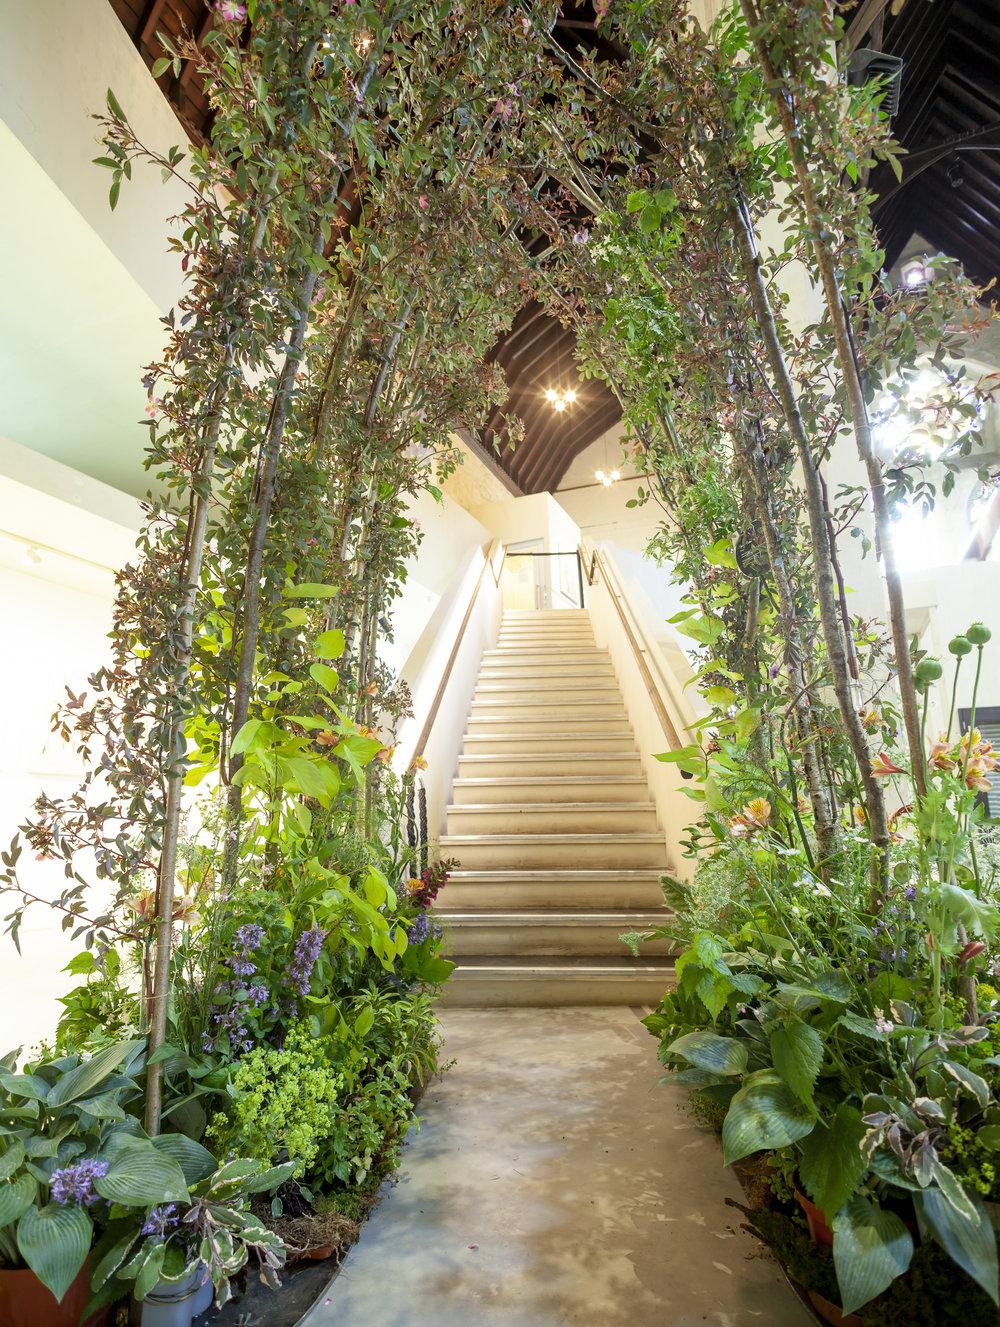 Harrys-Flowers-installation-British-Flowers-Week-2018-at-Garden-Museum-by-New-Covent-Garden-Market (1).jpg